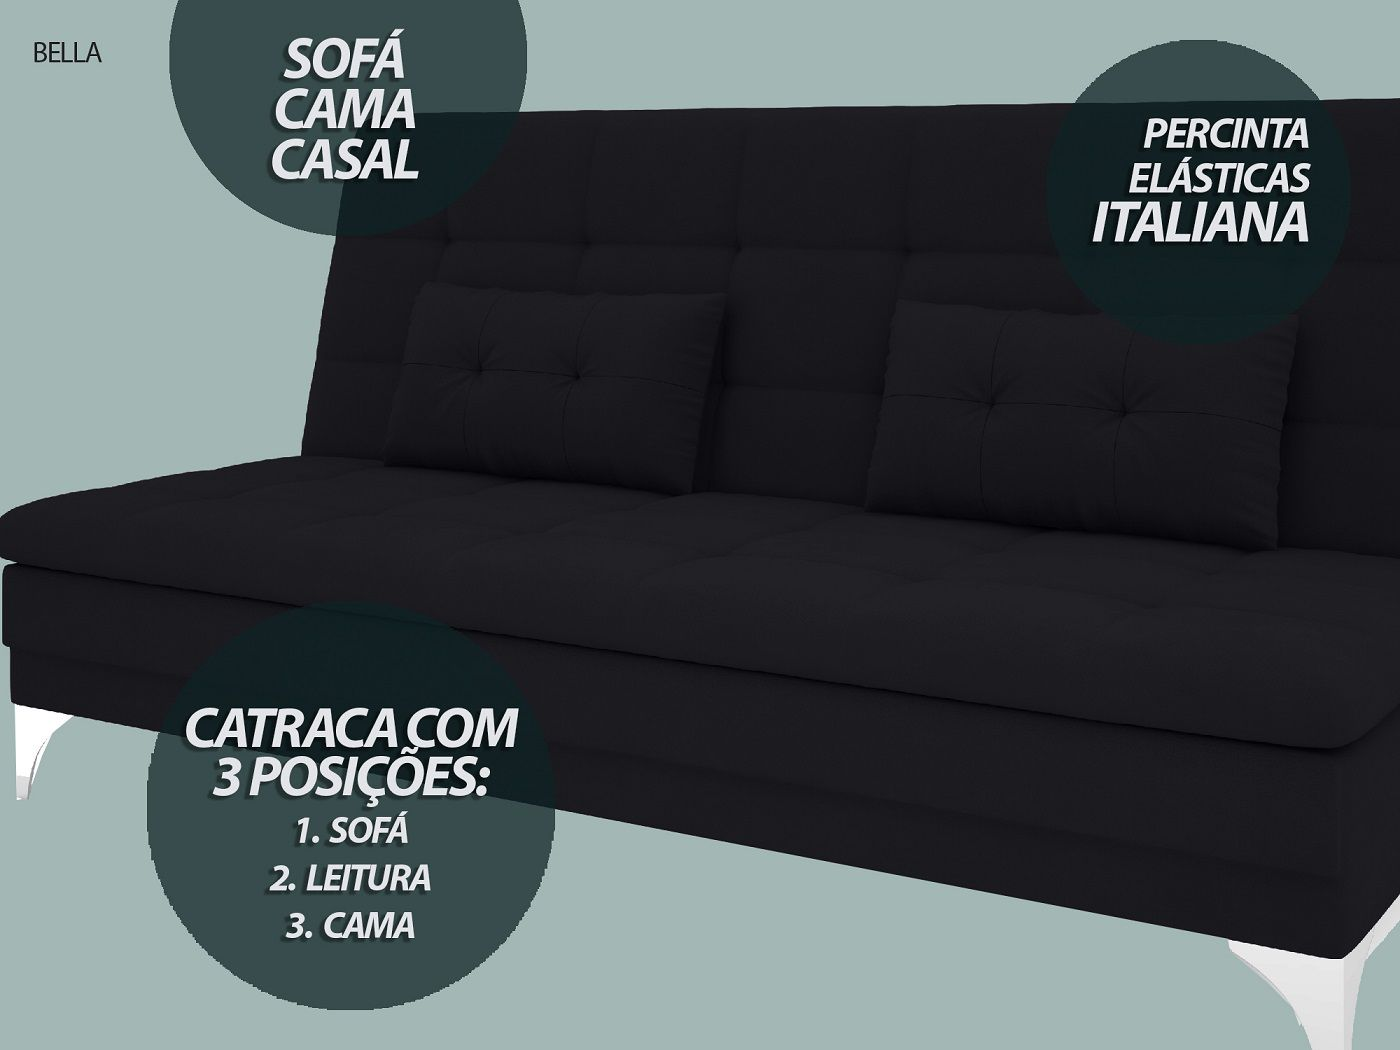 Sofá-Cama Casal New Bella 1,87m Velosuede Preto - NETSOFAS  - NETSOFÁS